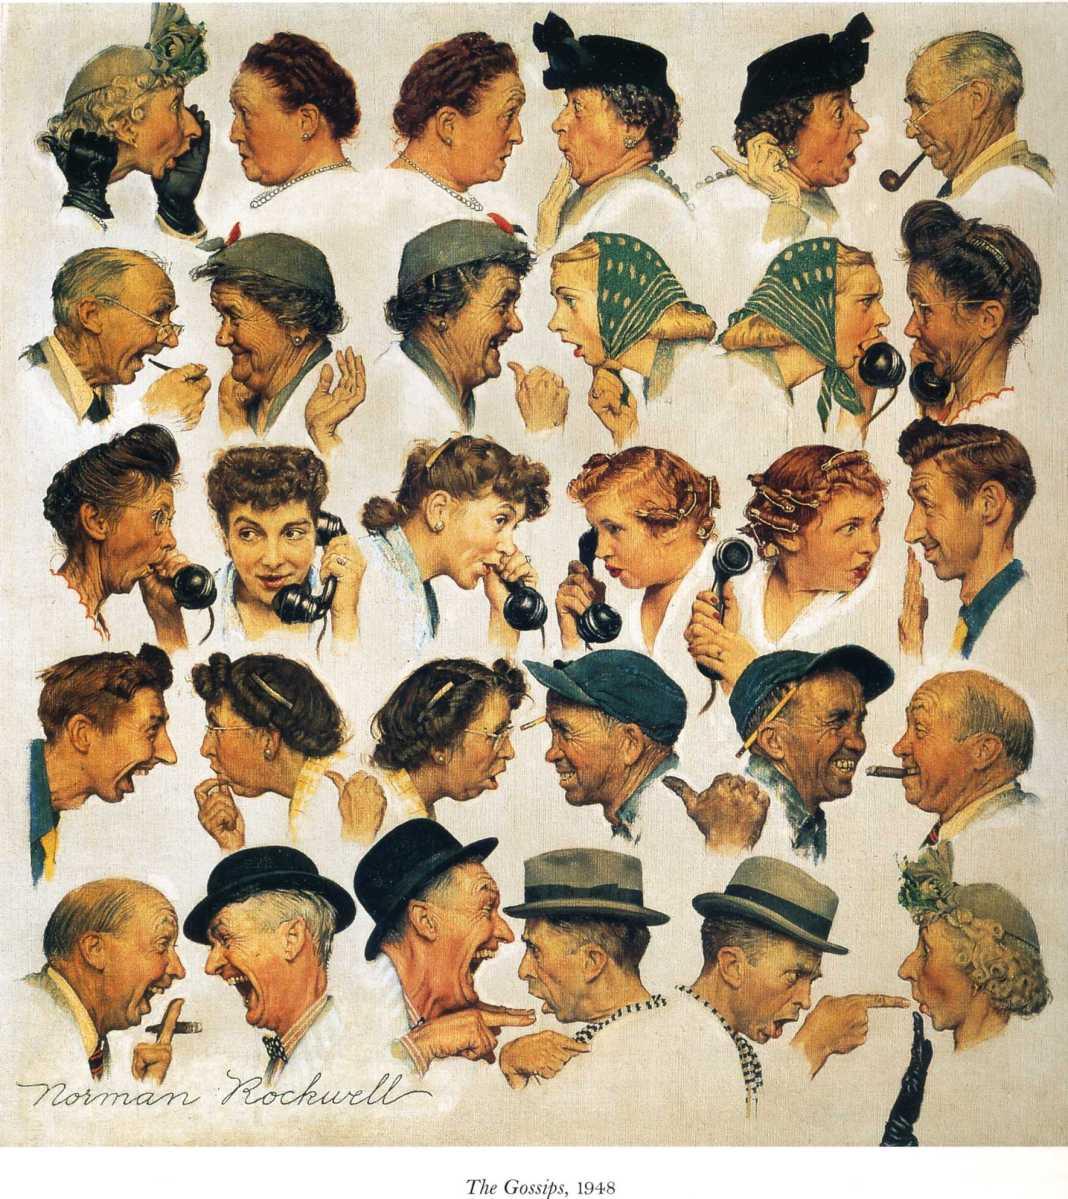 Norman Rockwell (1894-1978) § Hyperréalisme